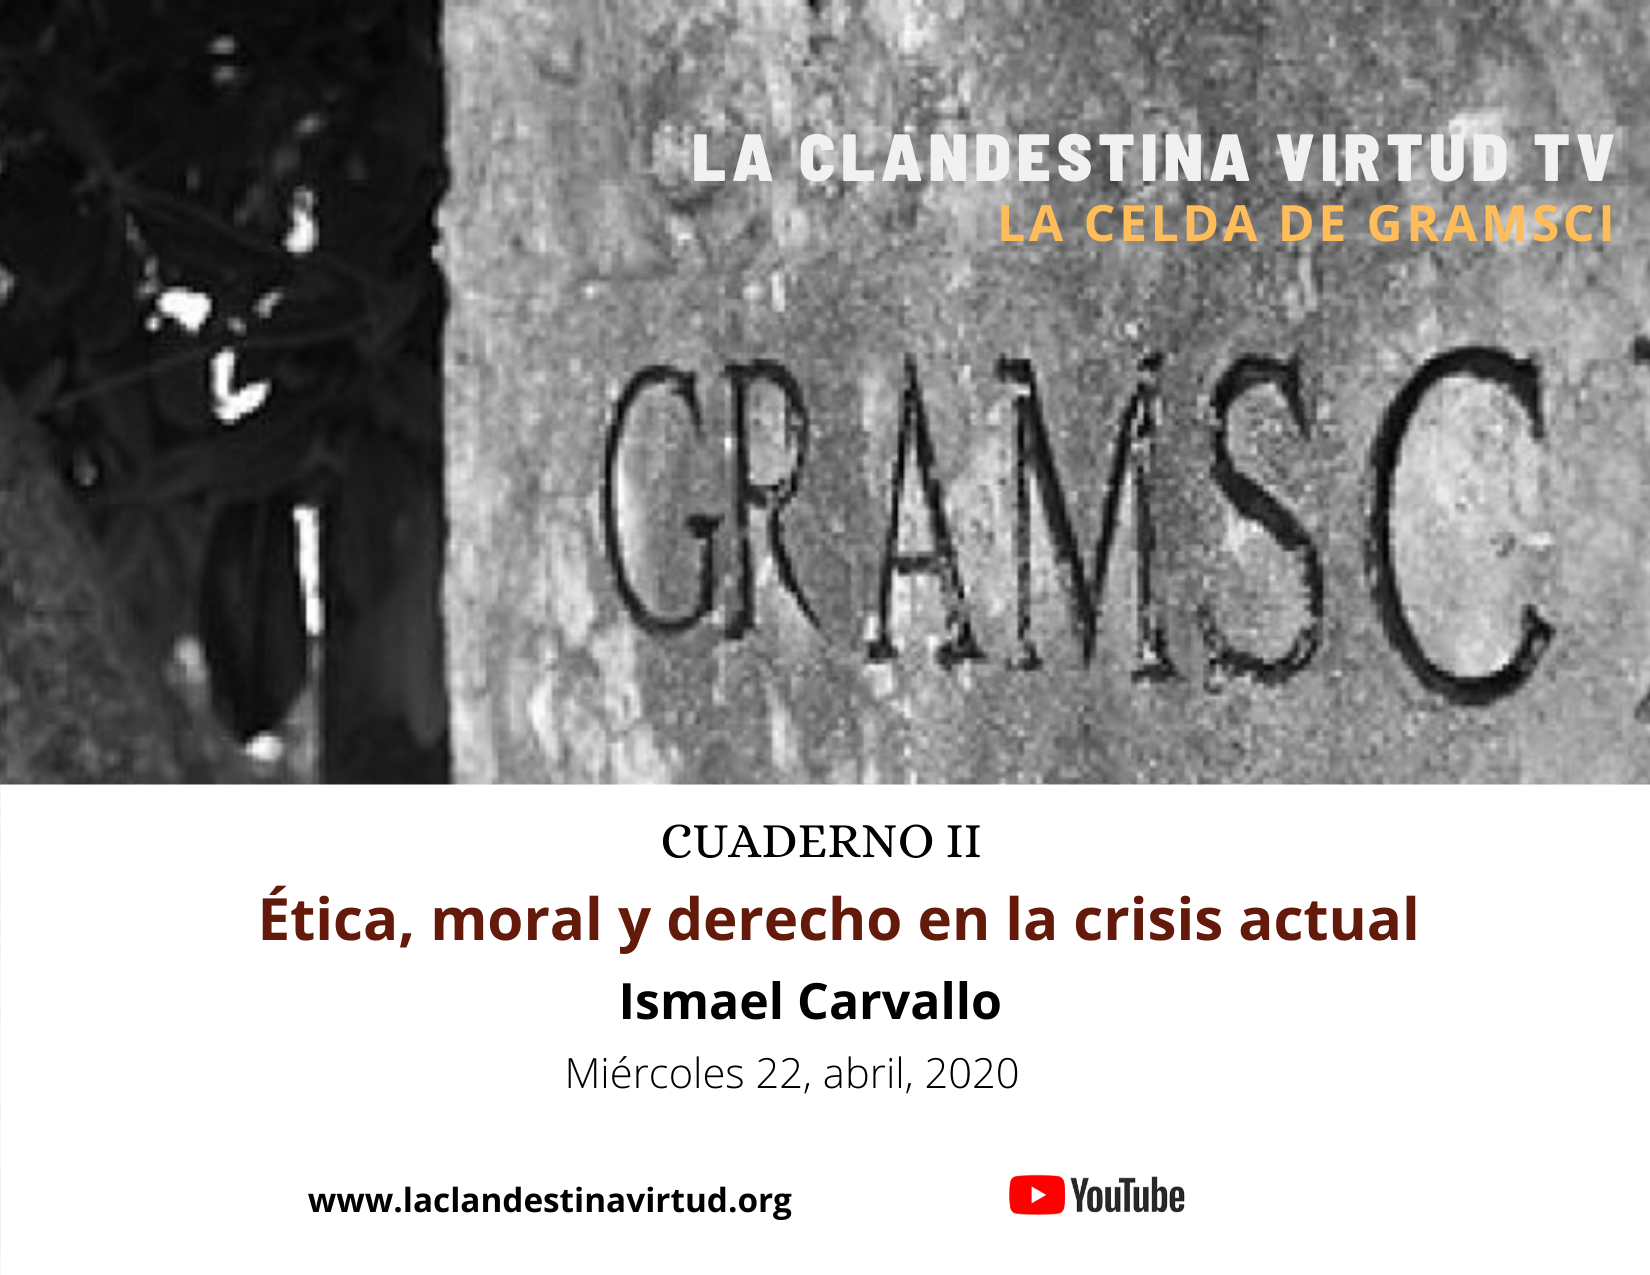 La celda de Gramsci II